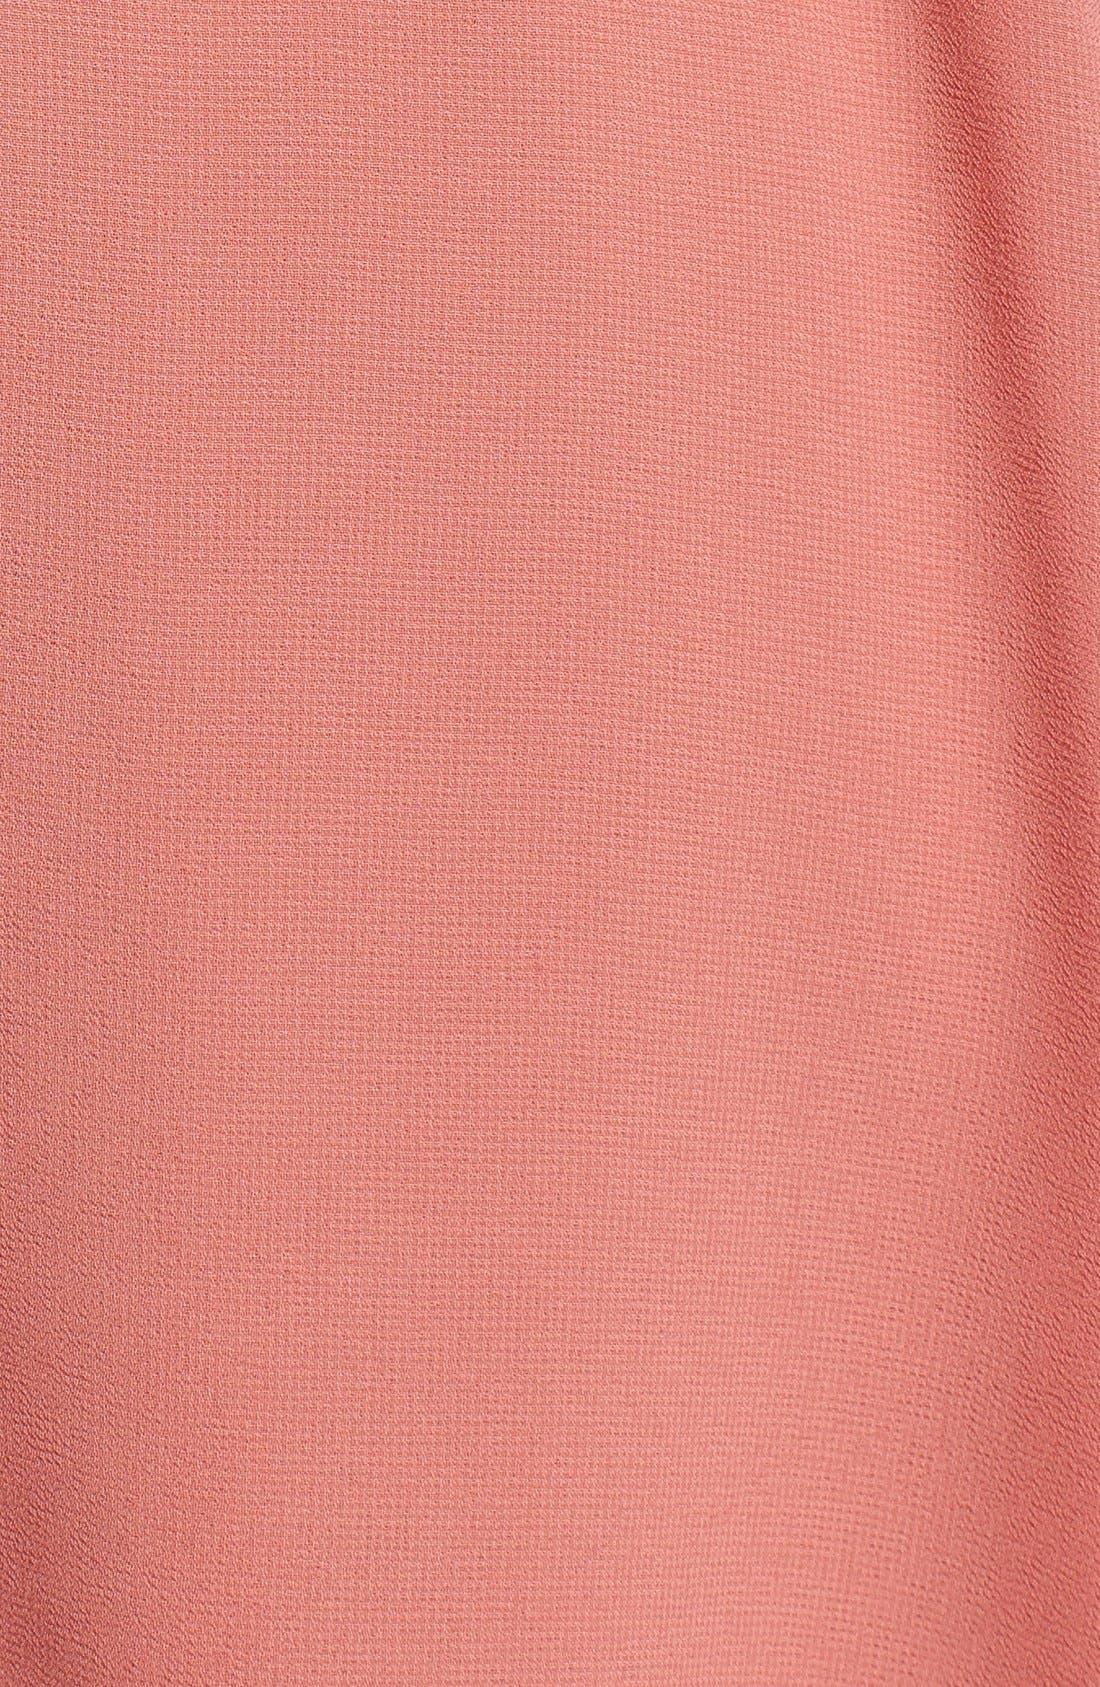 Blouson Chiffon Skater Dress,                             Alternate thumbnail 224, color,